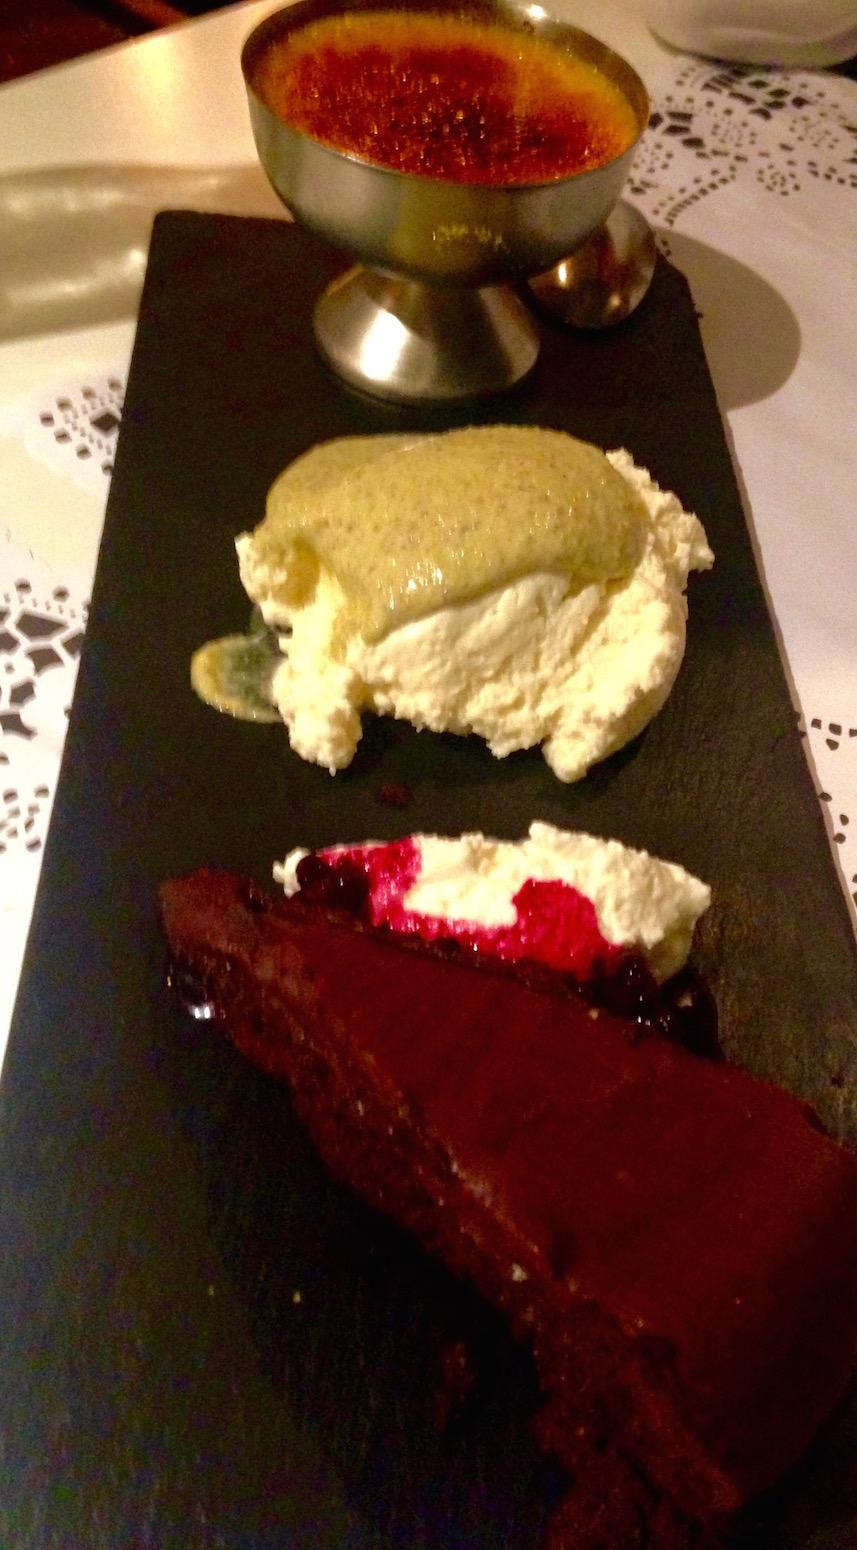 dessert tasting menu